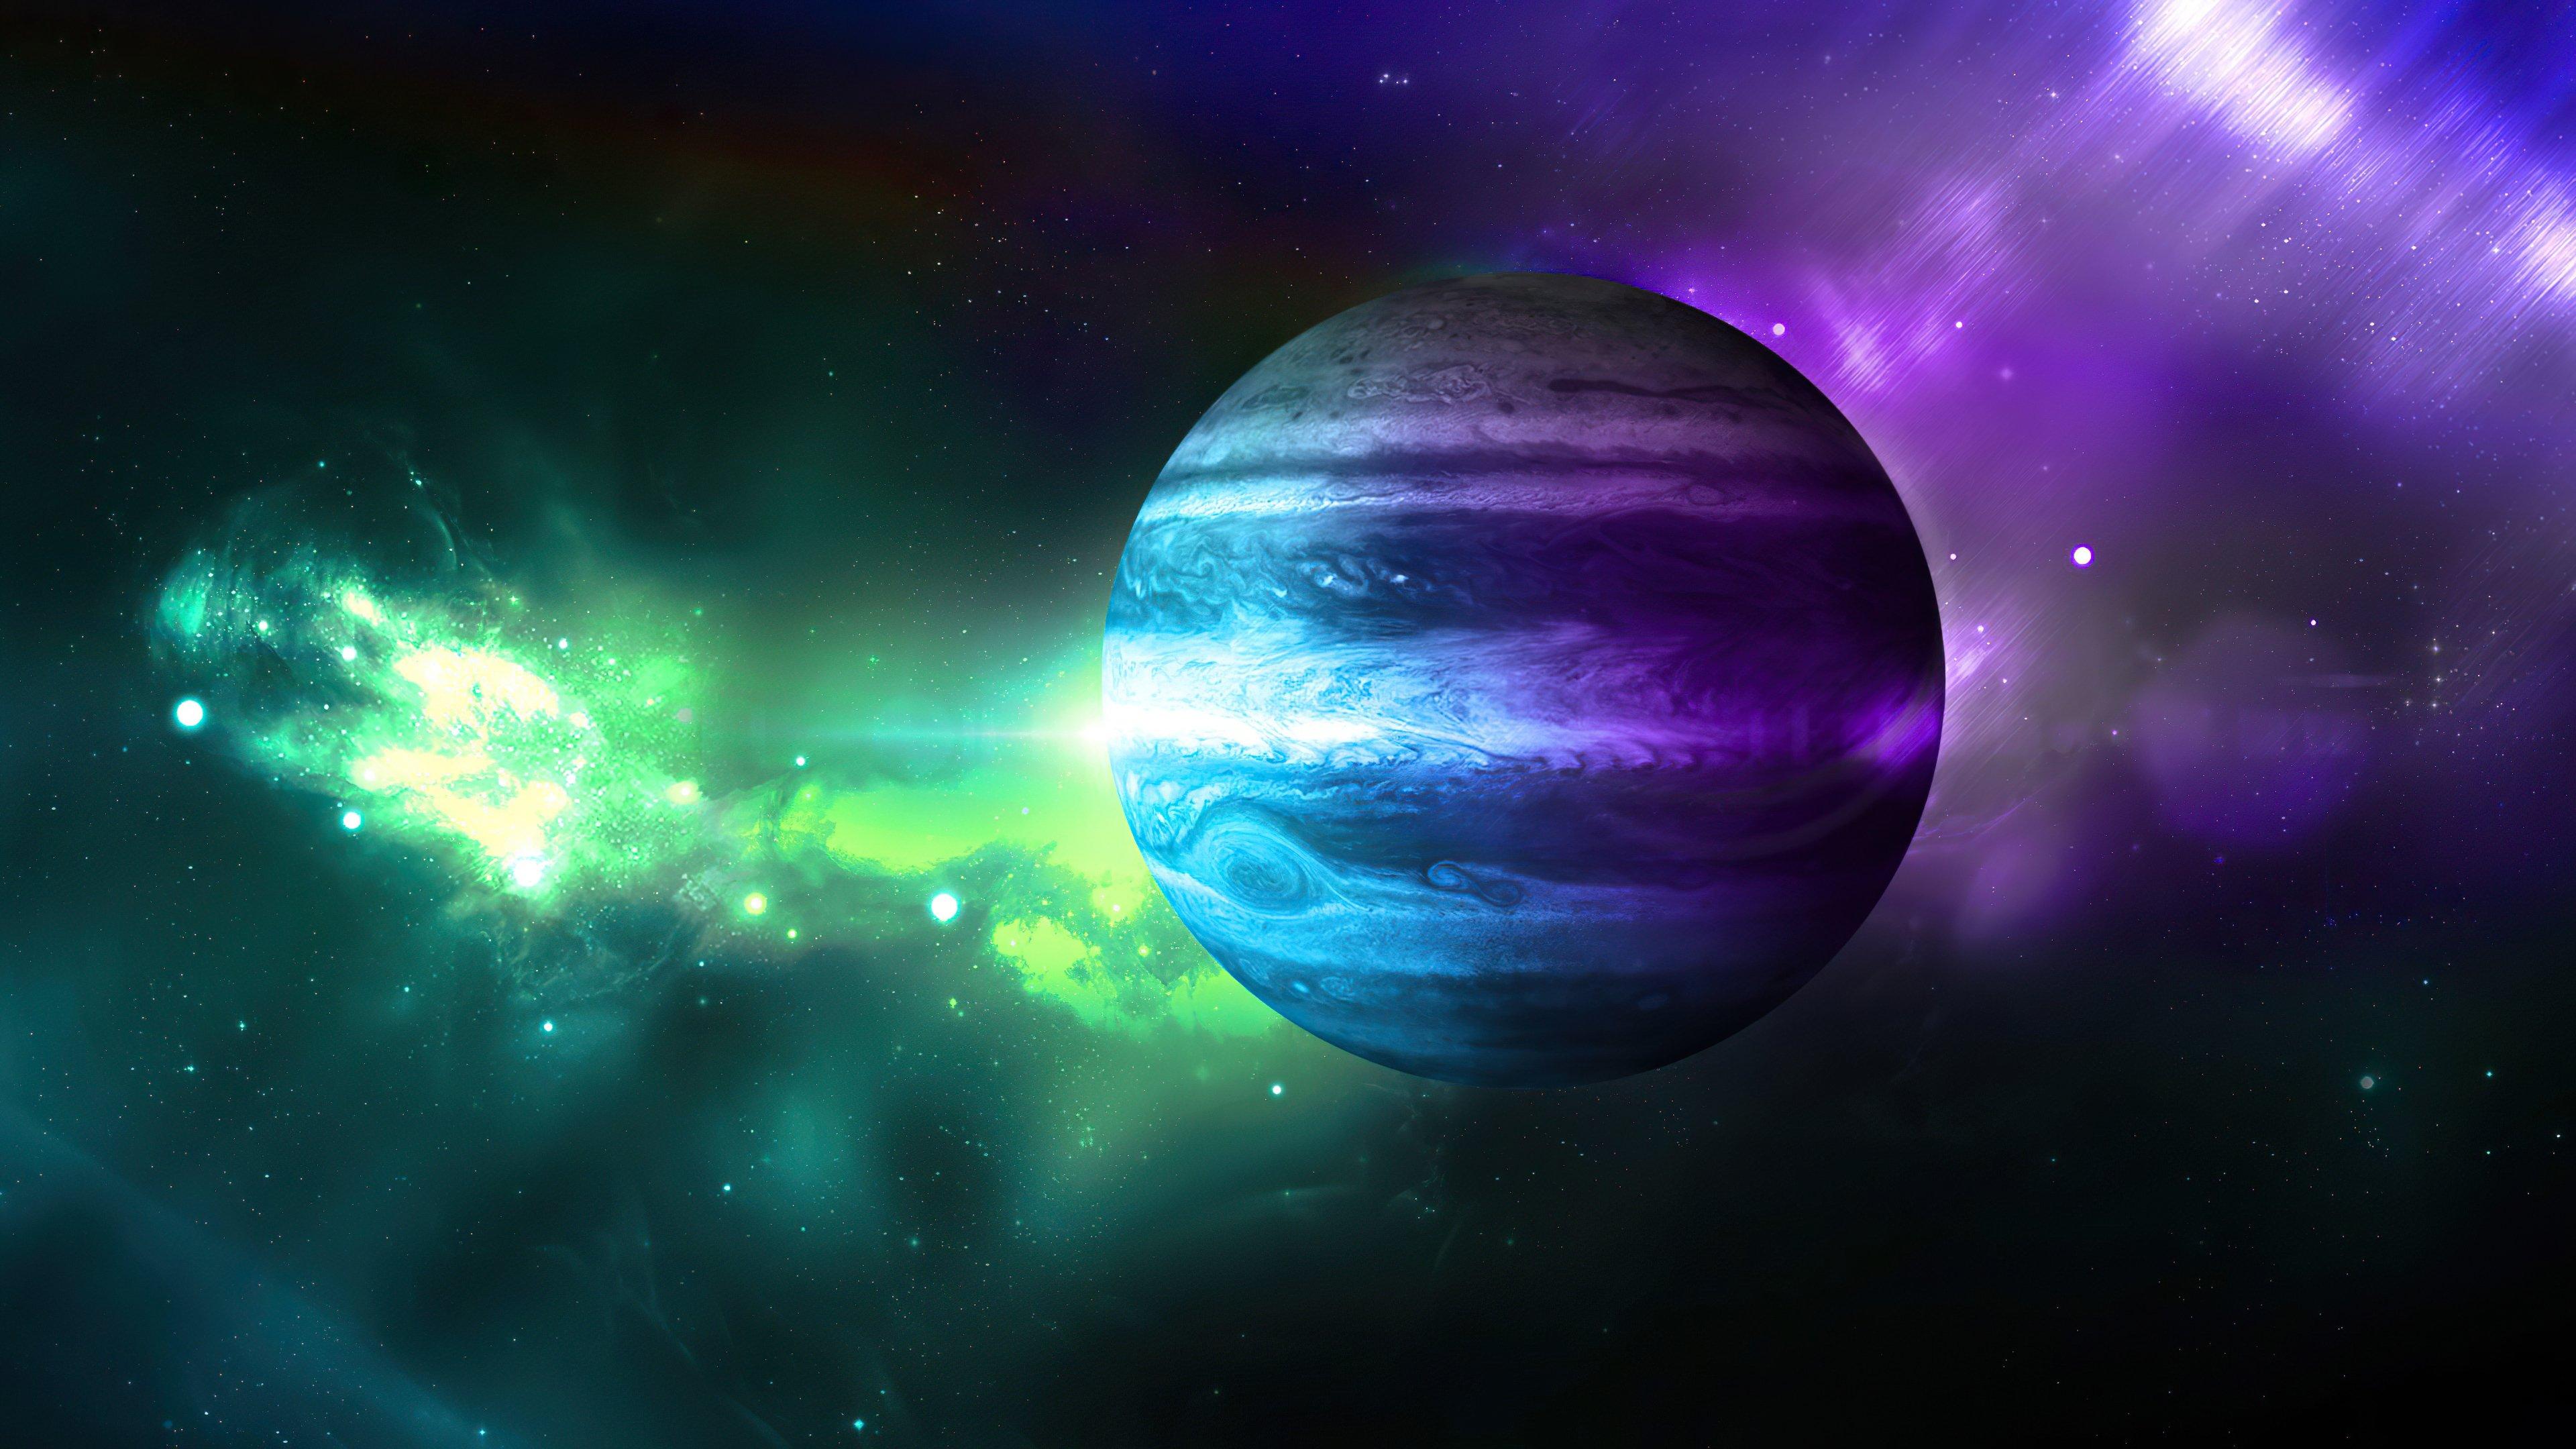 Wallpaper Planet in galaxy